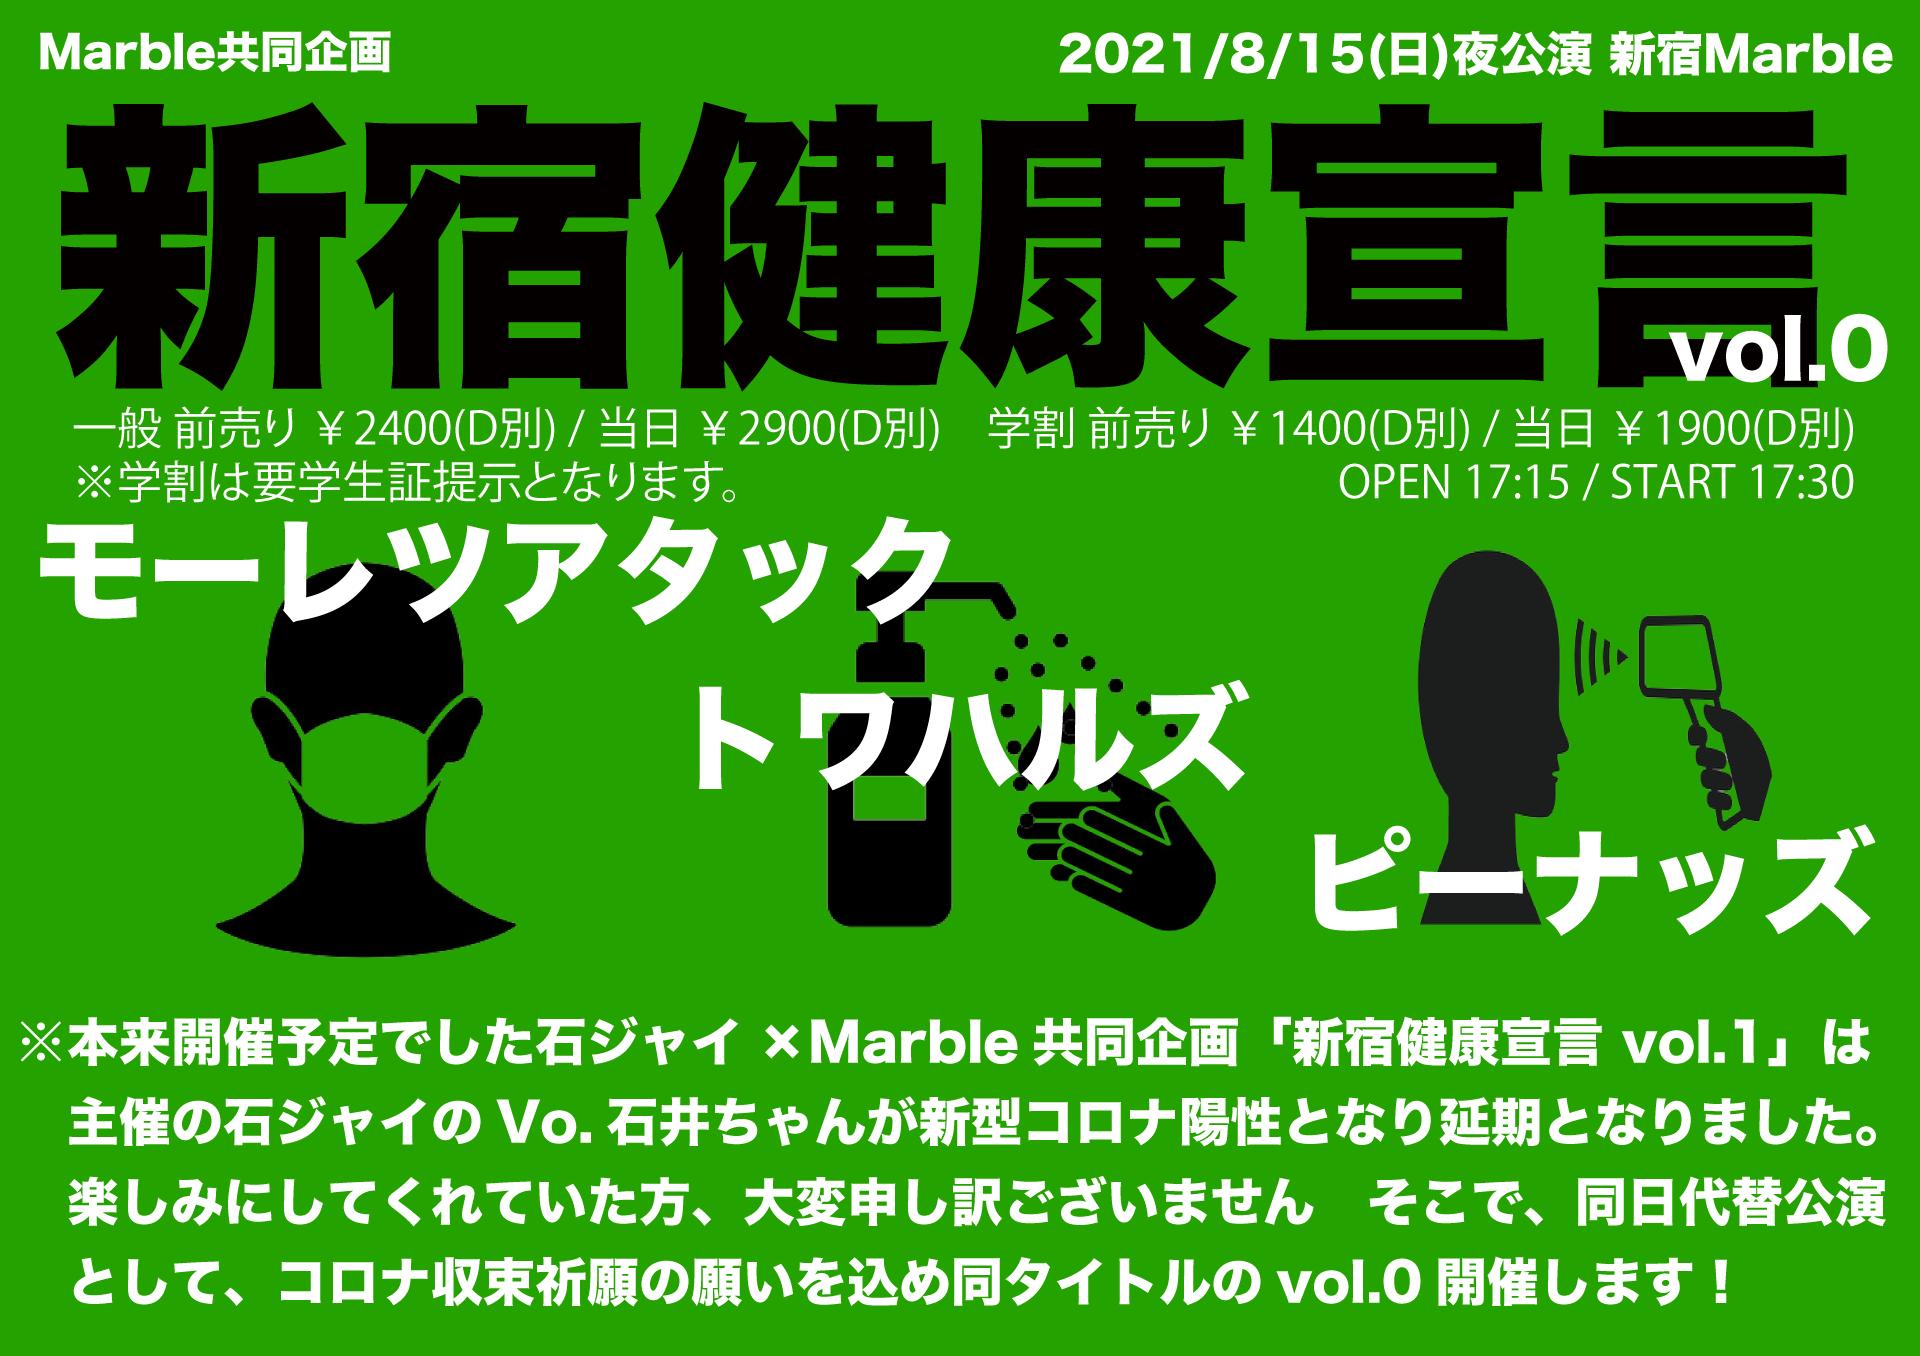 Marble共同企画 「新宿健康宣言 vol.0」